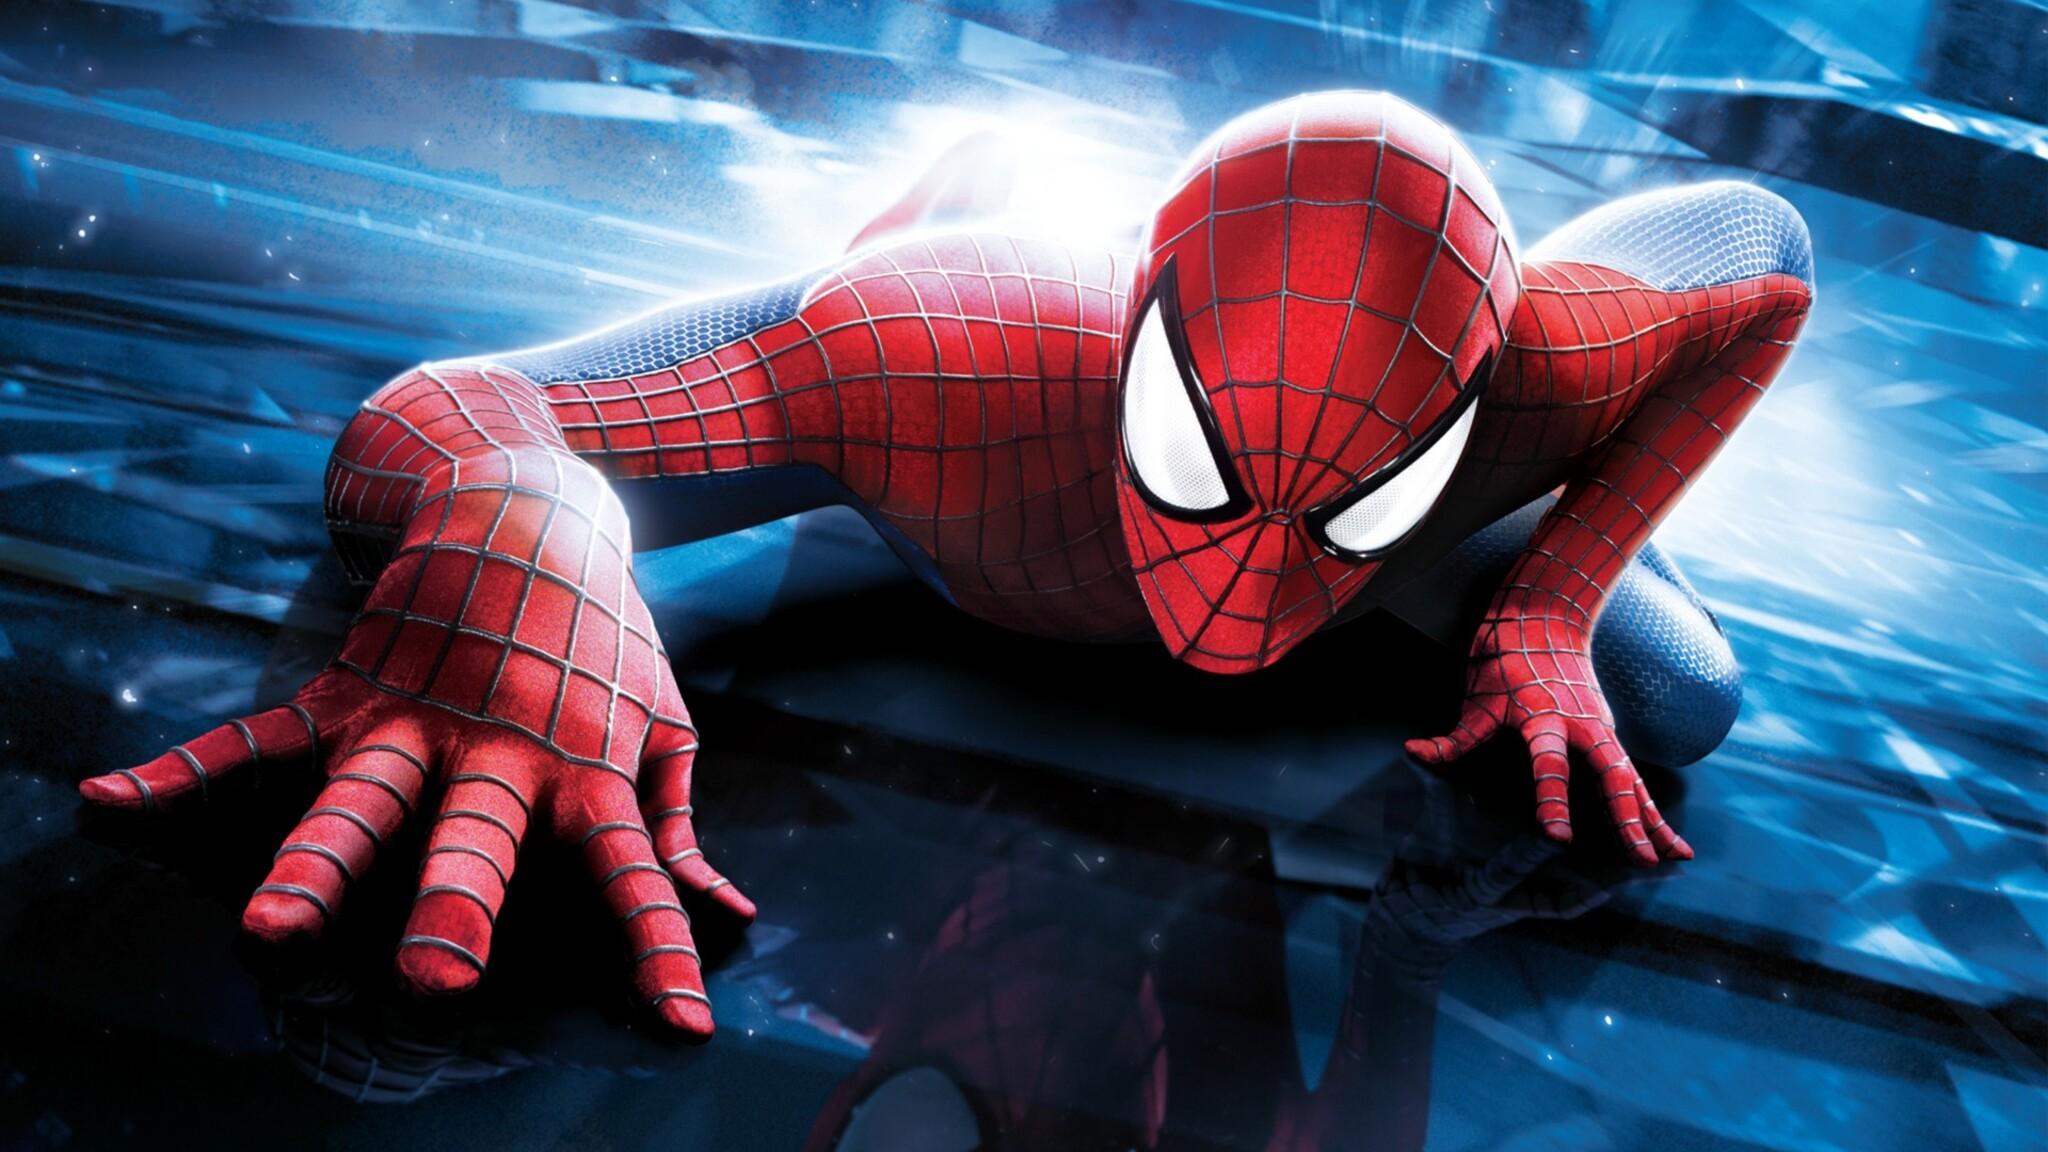 2048x1152 spiderman 2048x1152 resolution hd 4k wallpapers - Images de spiderman ...